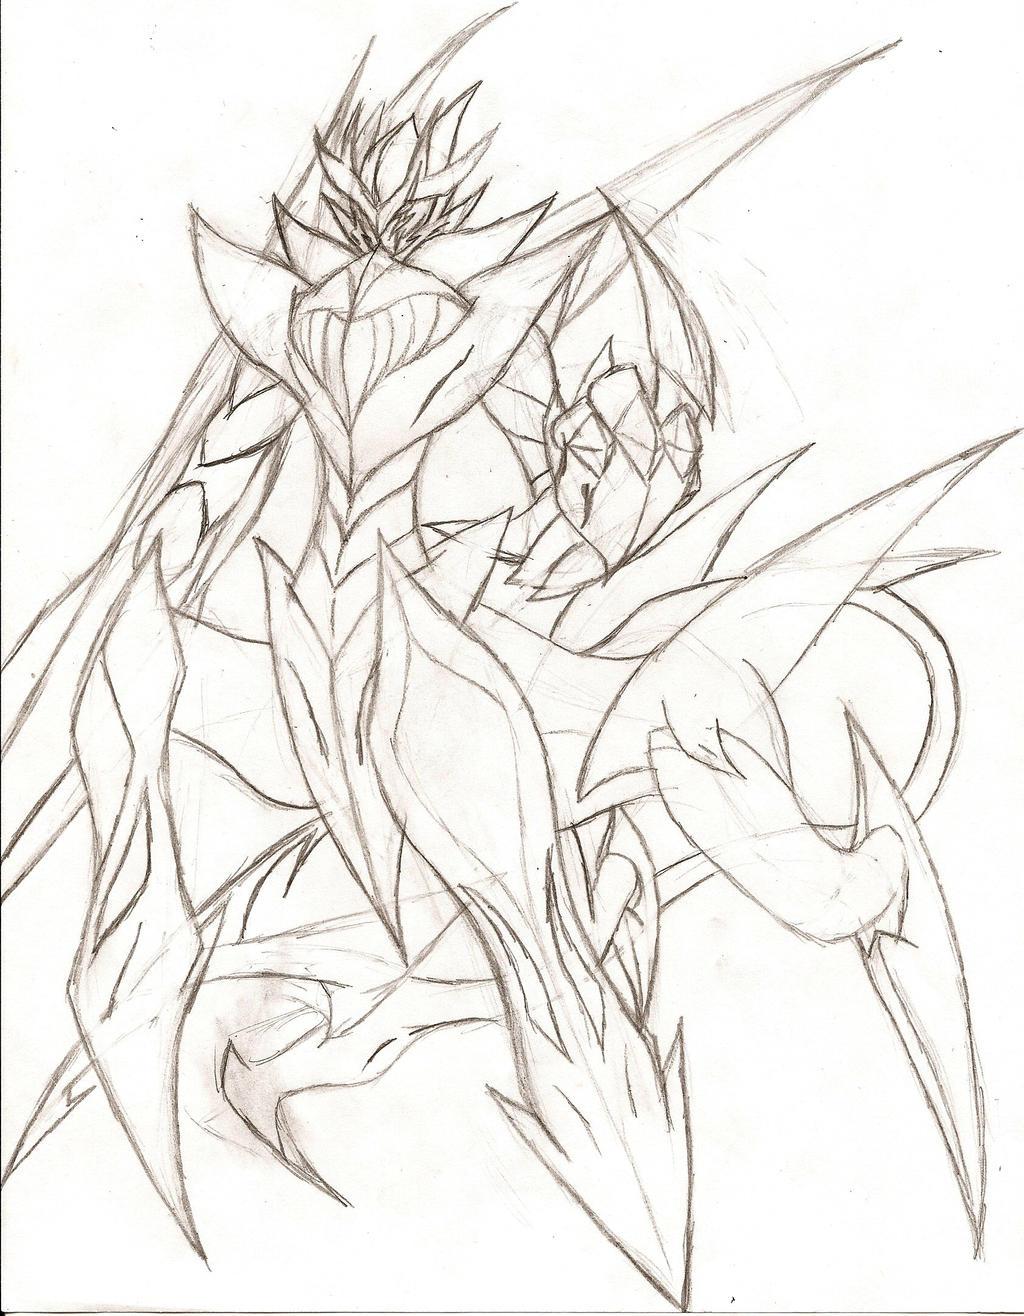 Owari no Seraph OC: The Devil Horsemen Apocalypse by NeonNeoz